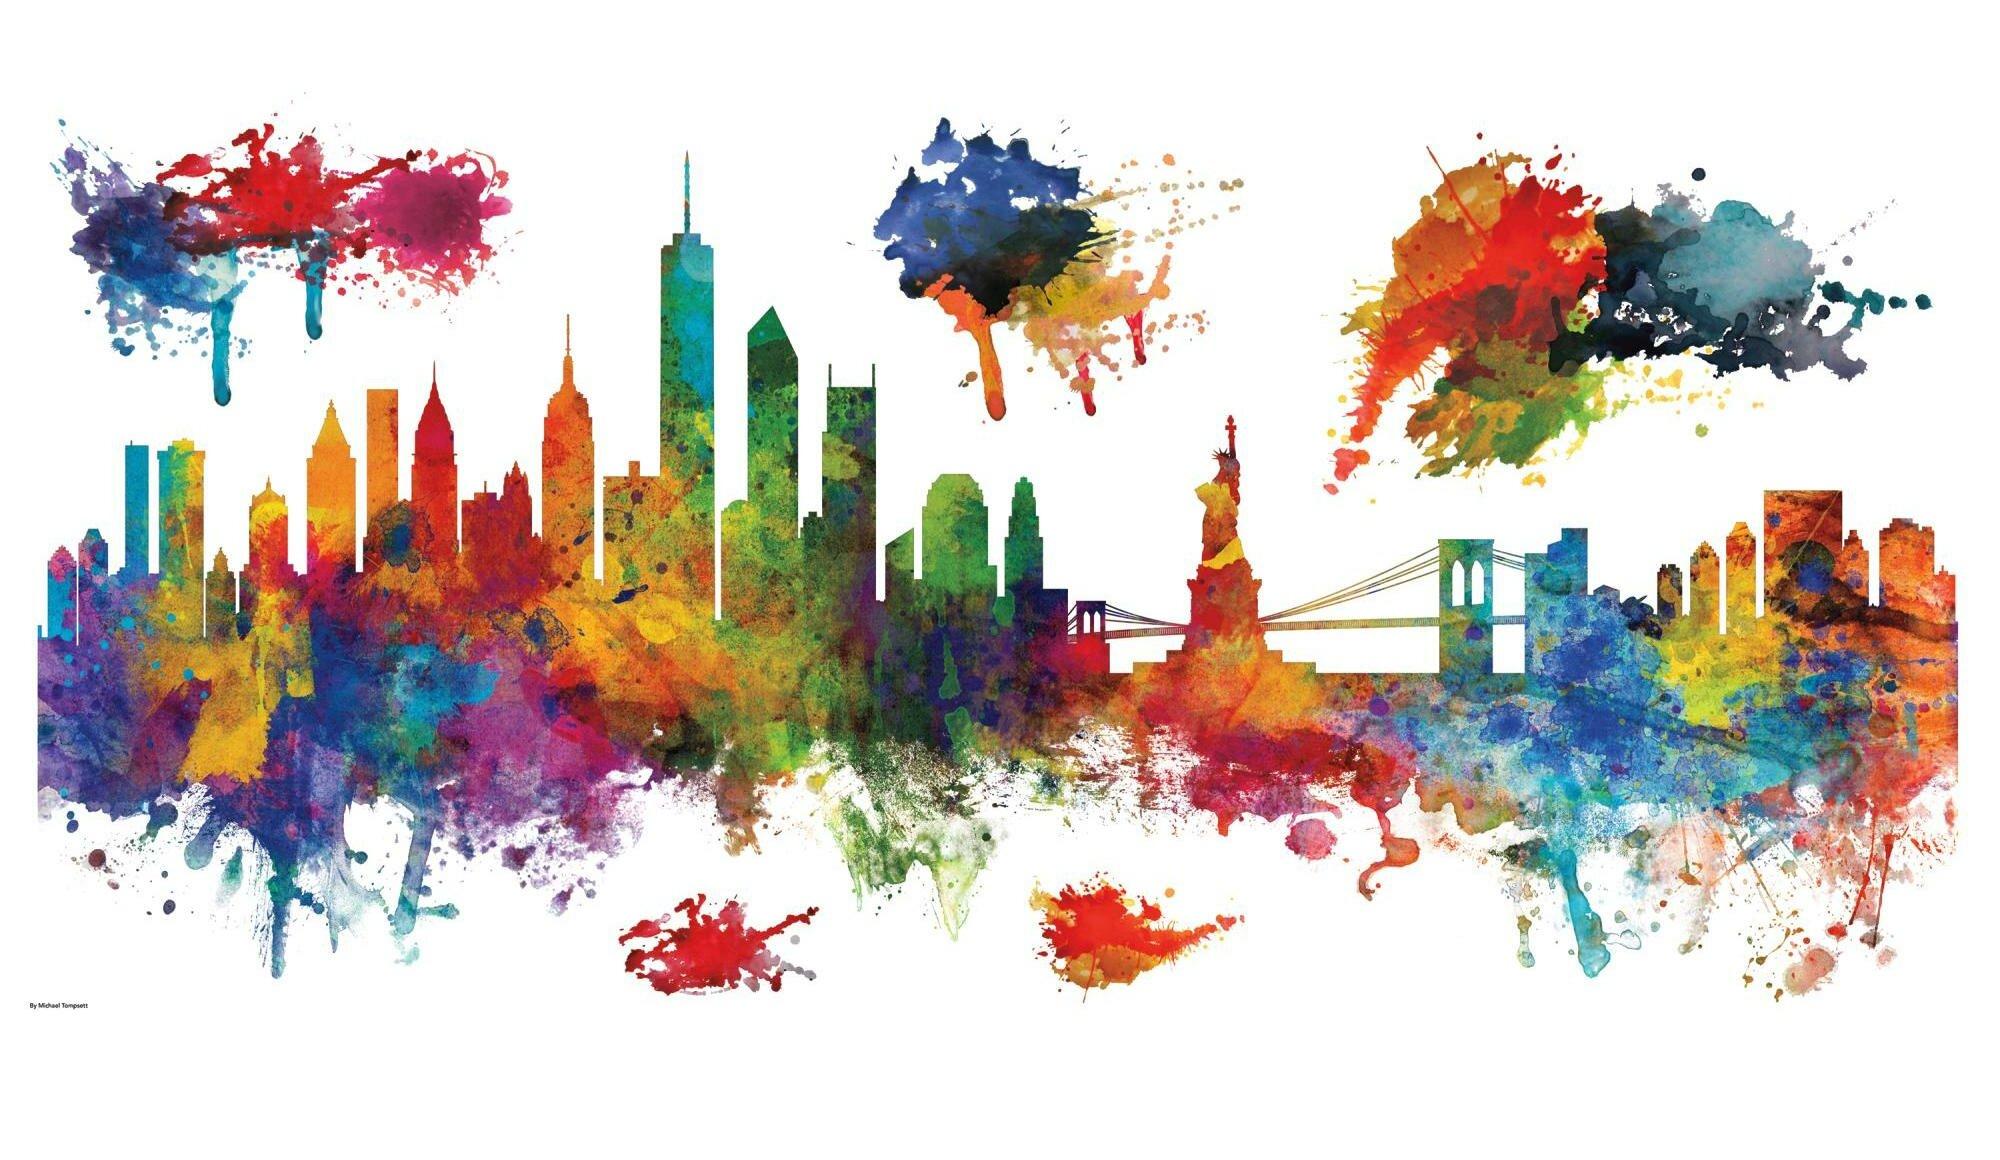 New York III City Skyline highest quality wall decal stickers